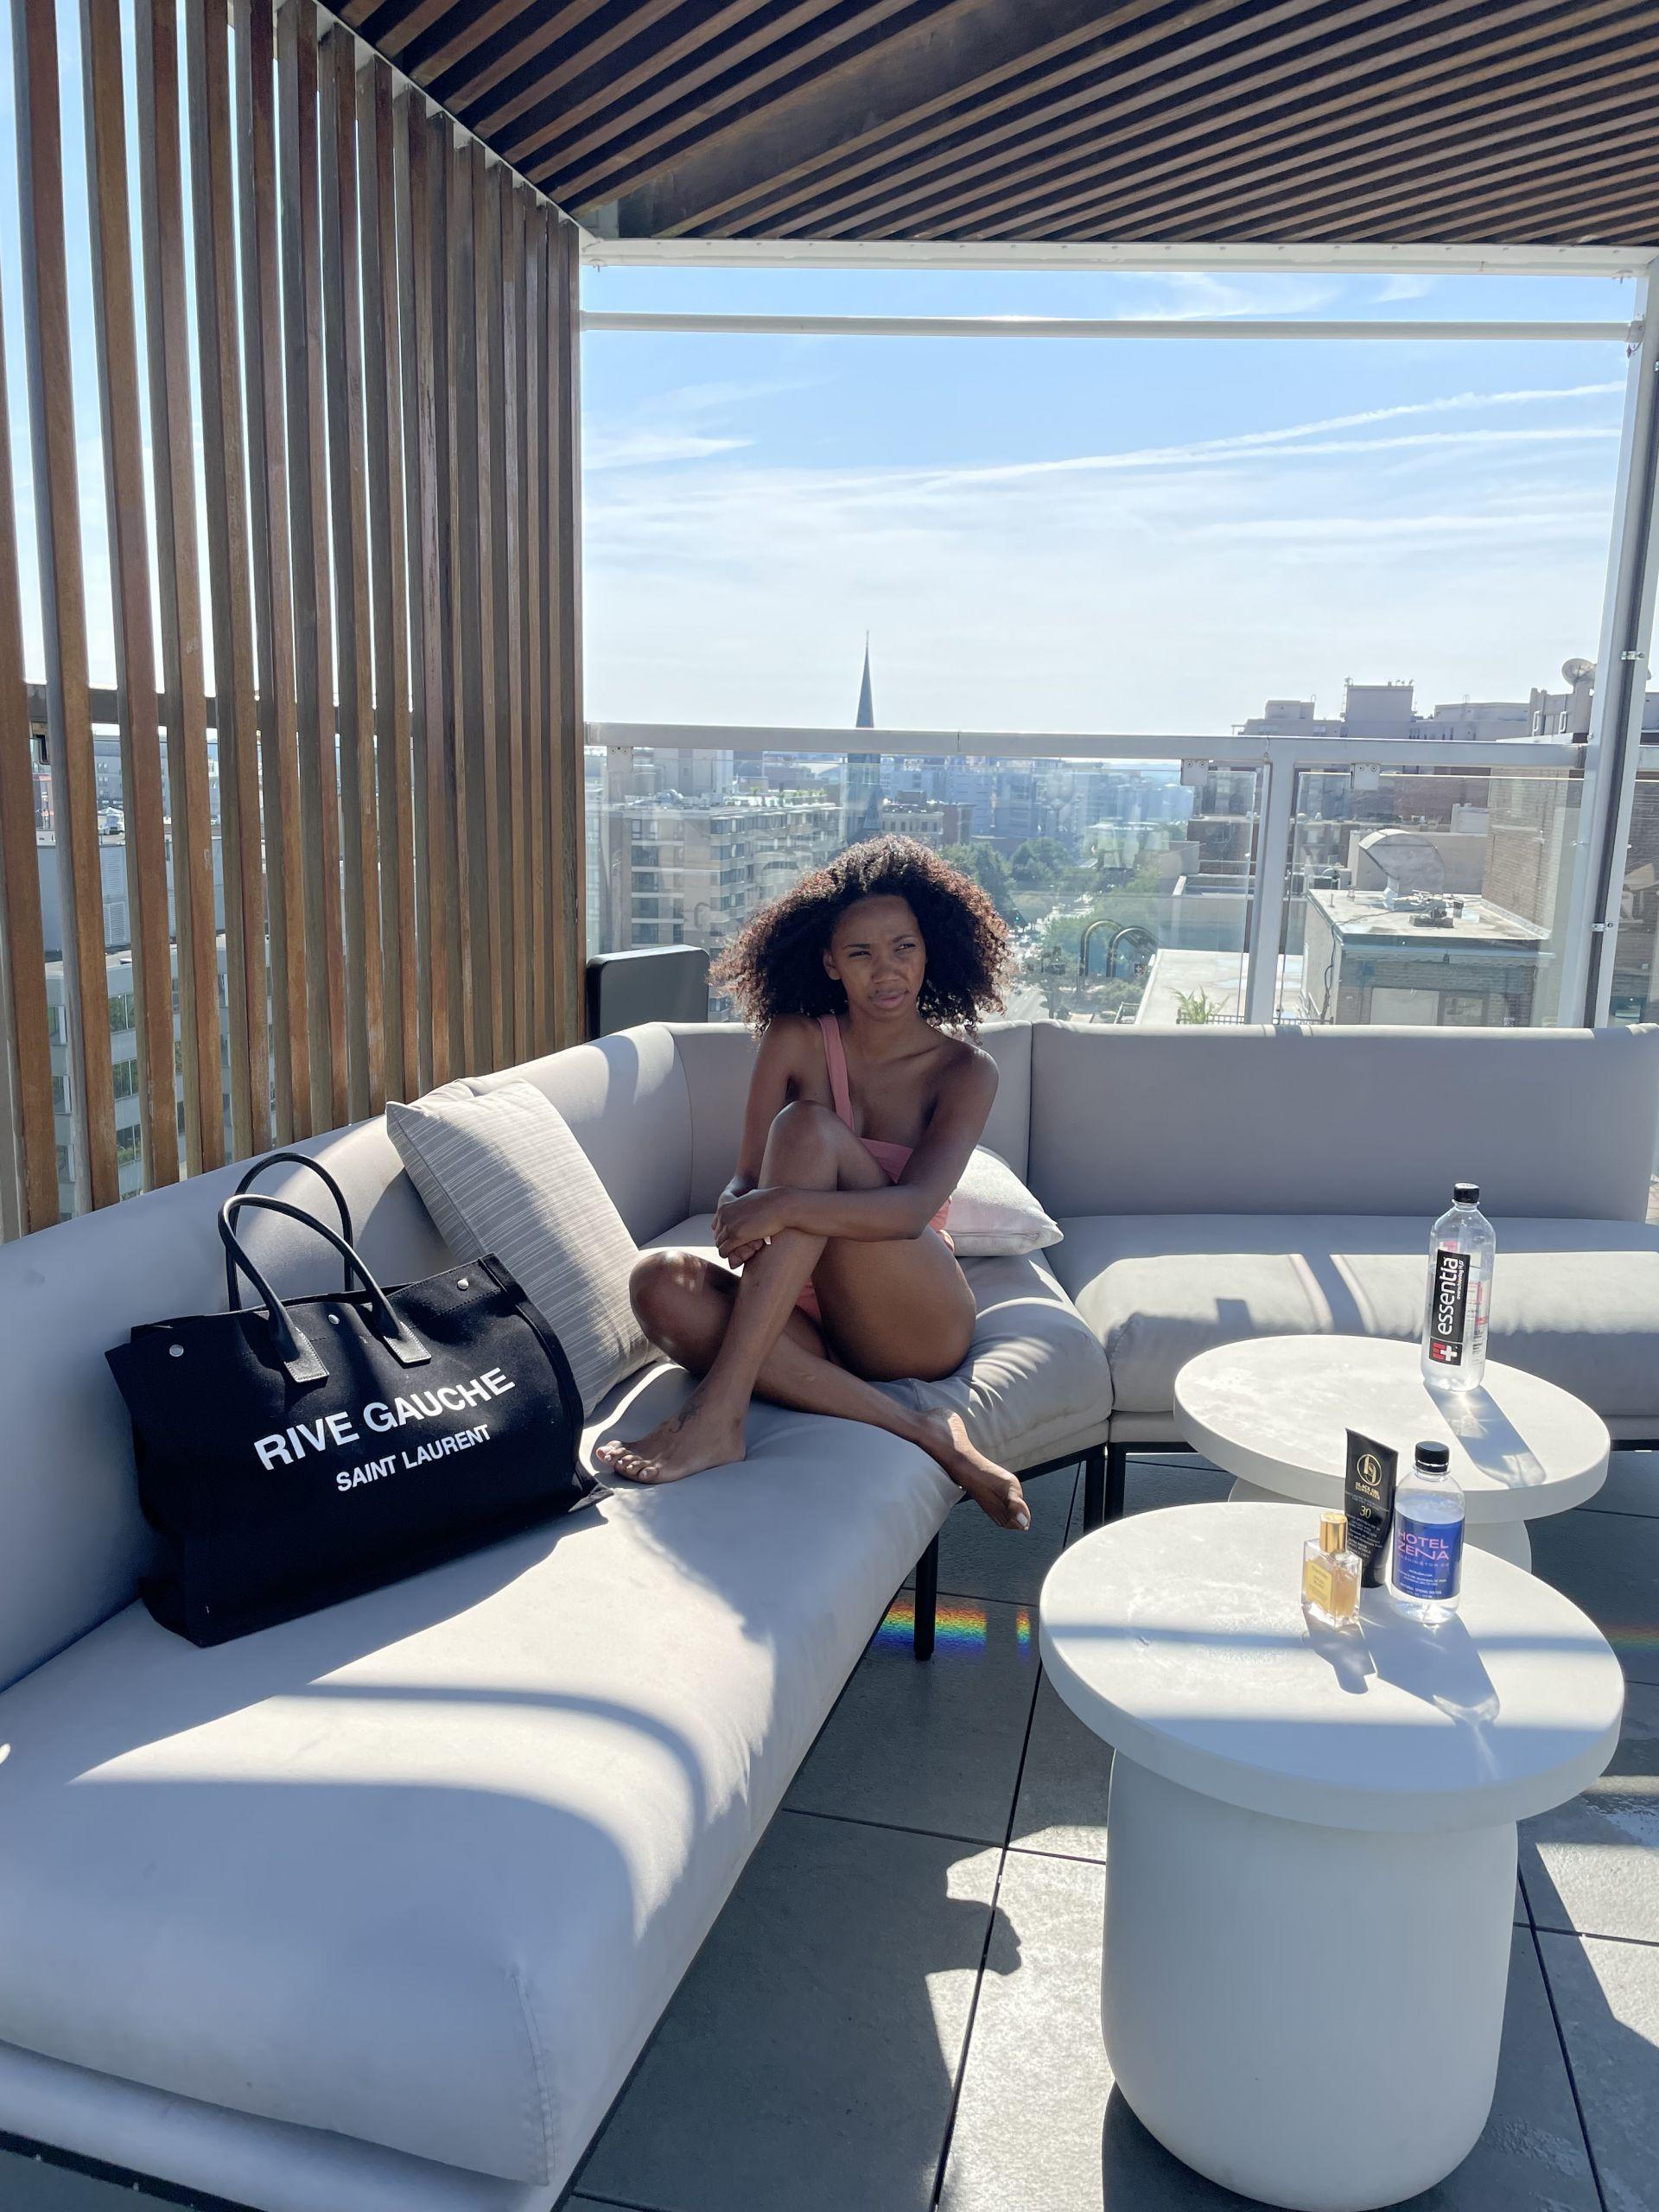 Hotel Zena Rooftop Washington D.C.